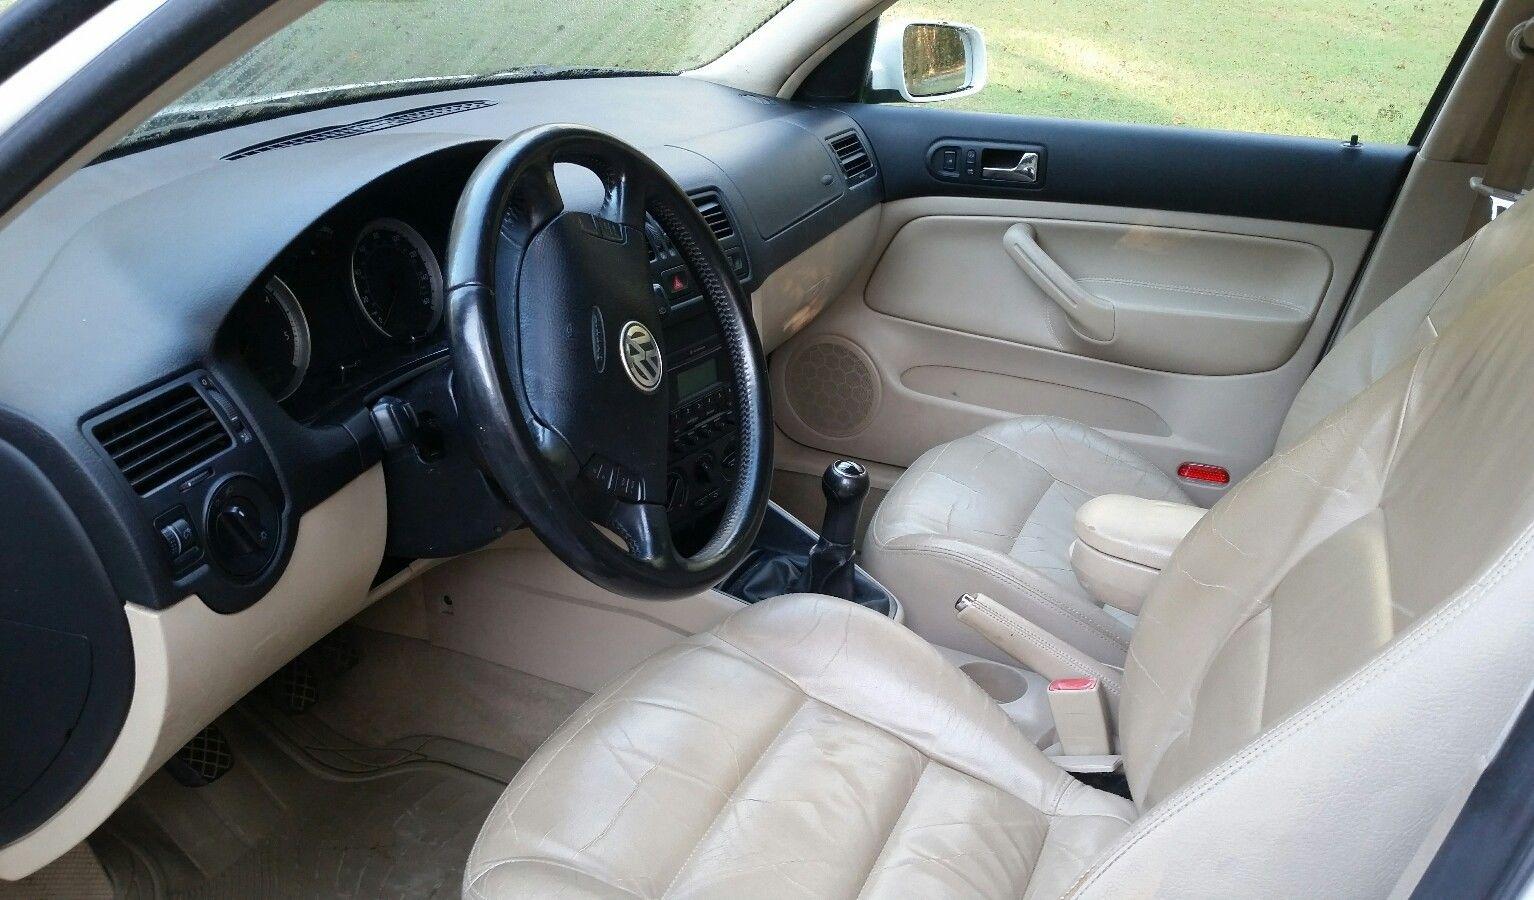 2005 Volkswagen Jetta Gls Vw White Jetta Wagon Tdi Manual With Tan Leather 2017 2018 Mycarboard Com